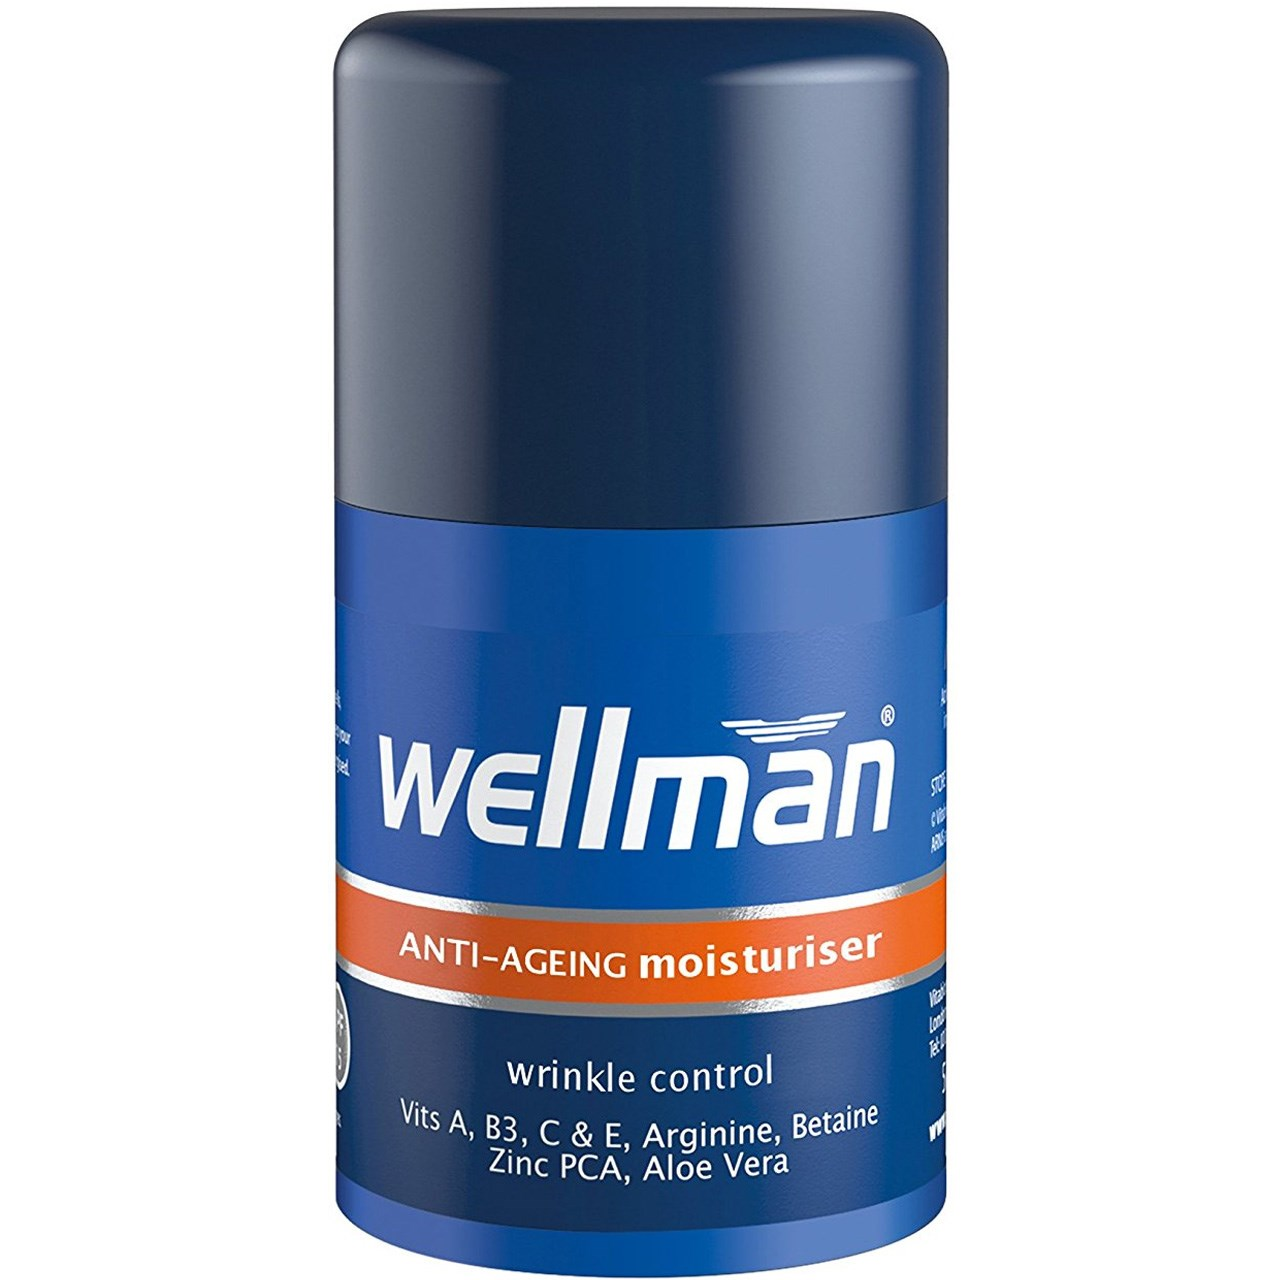 قیمت کرم ضدچروک مردانه ولمن مدل Wrinkle Control حجم 50 میلی لیتر